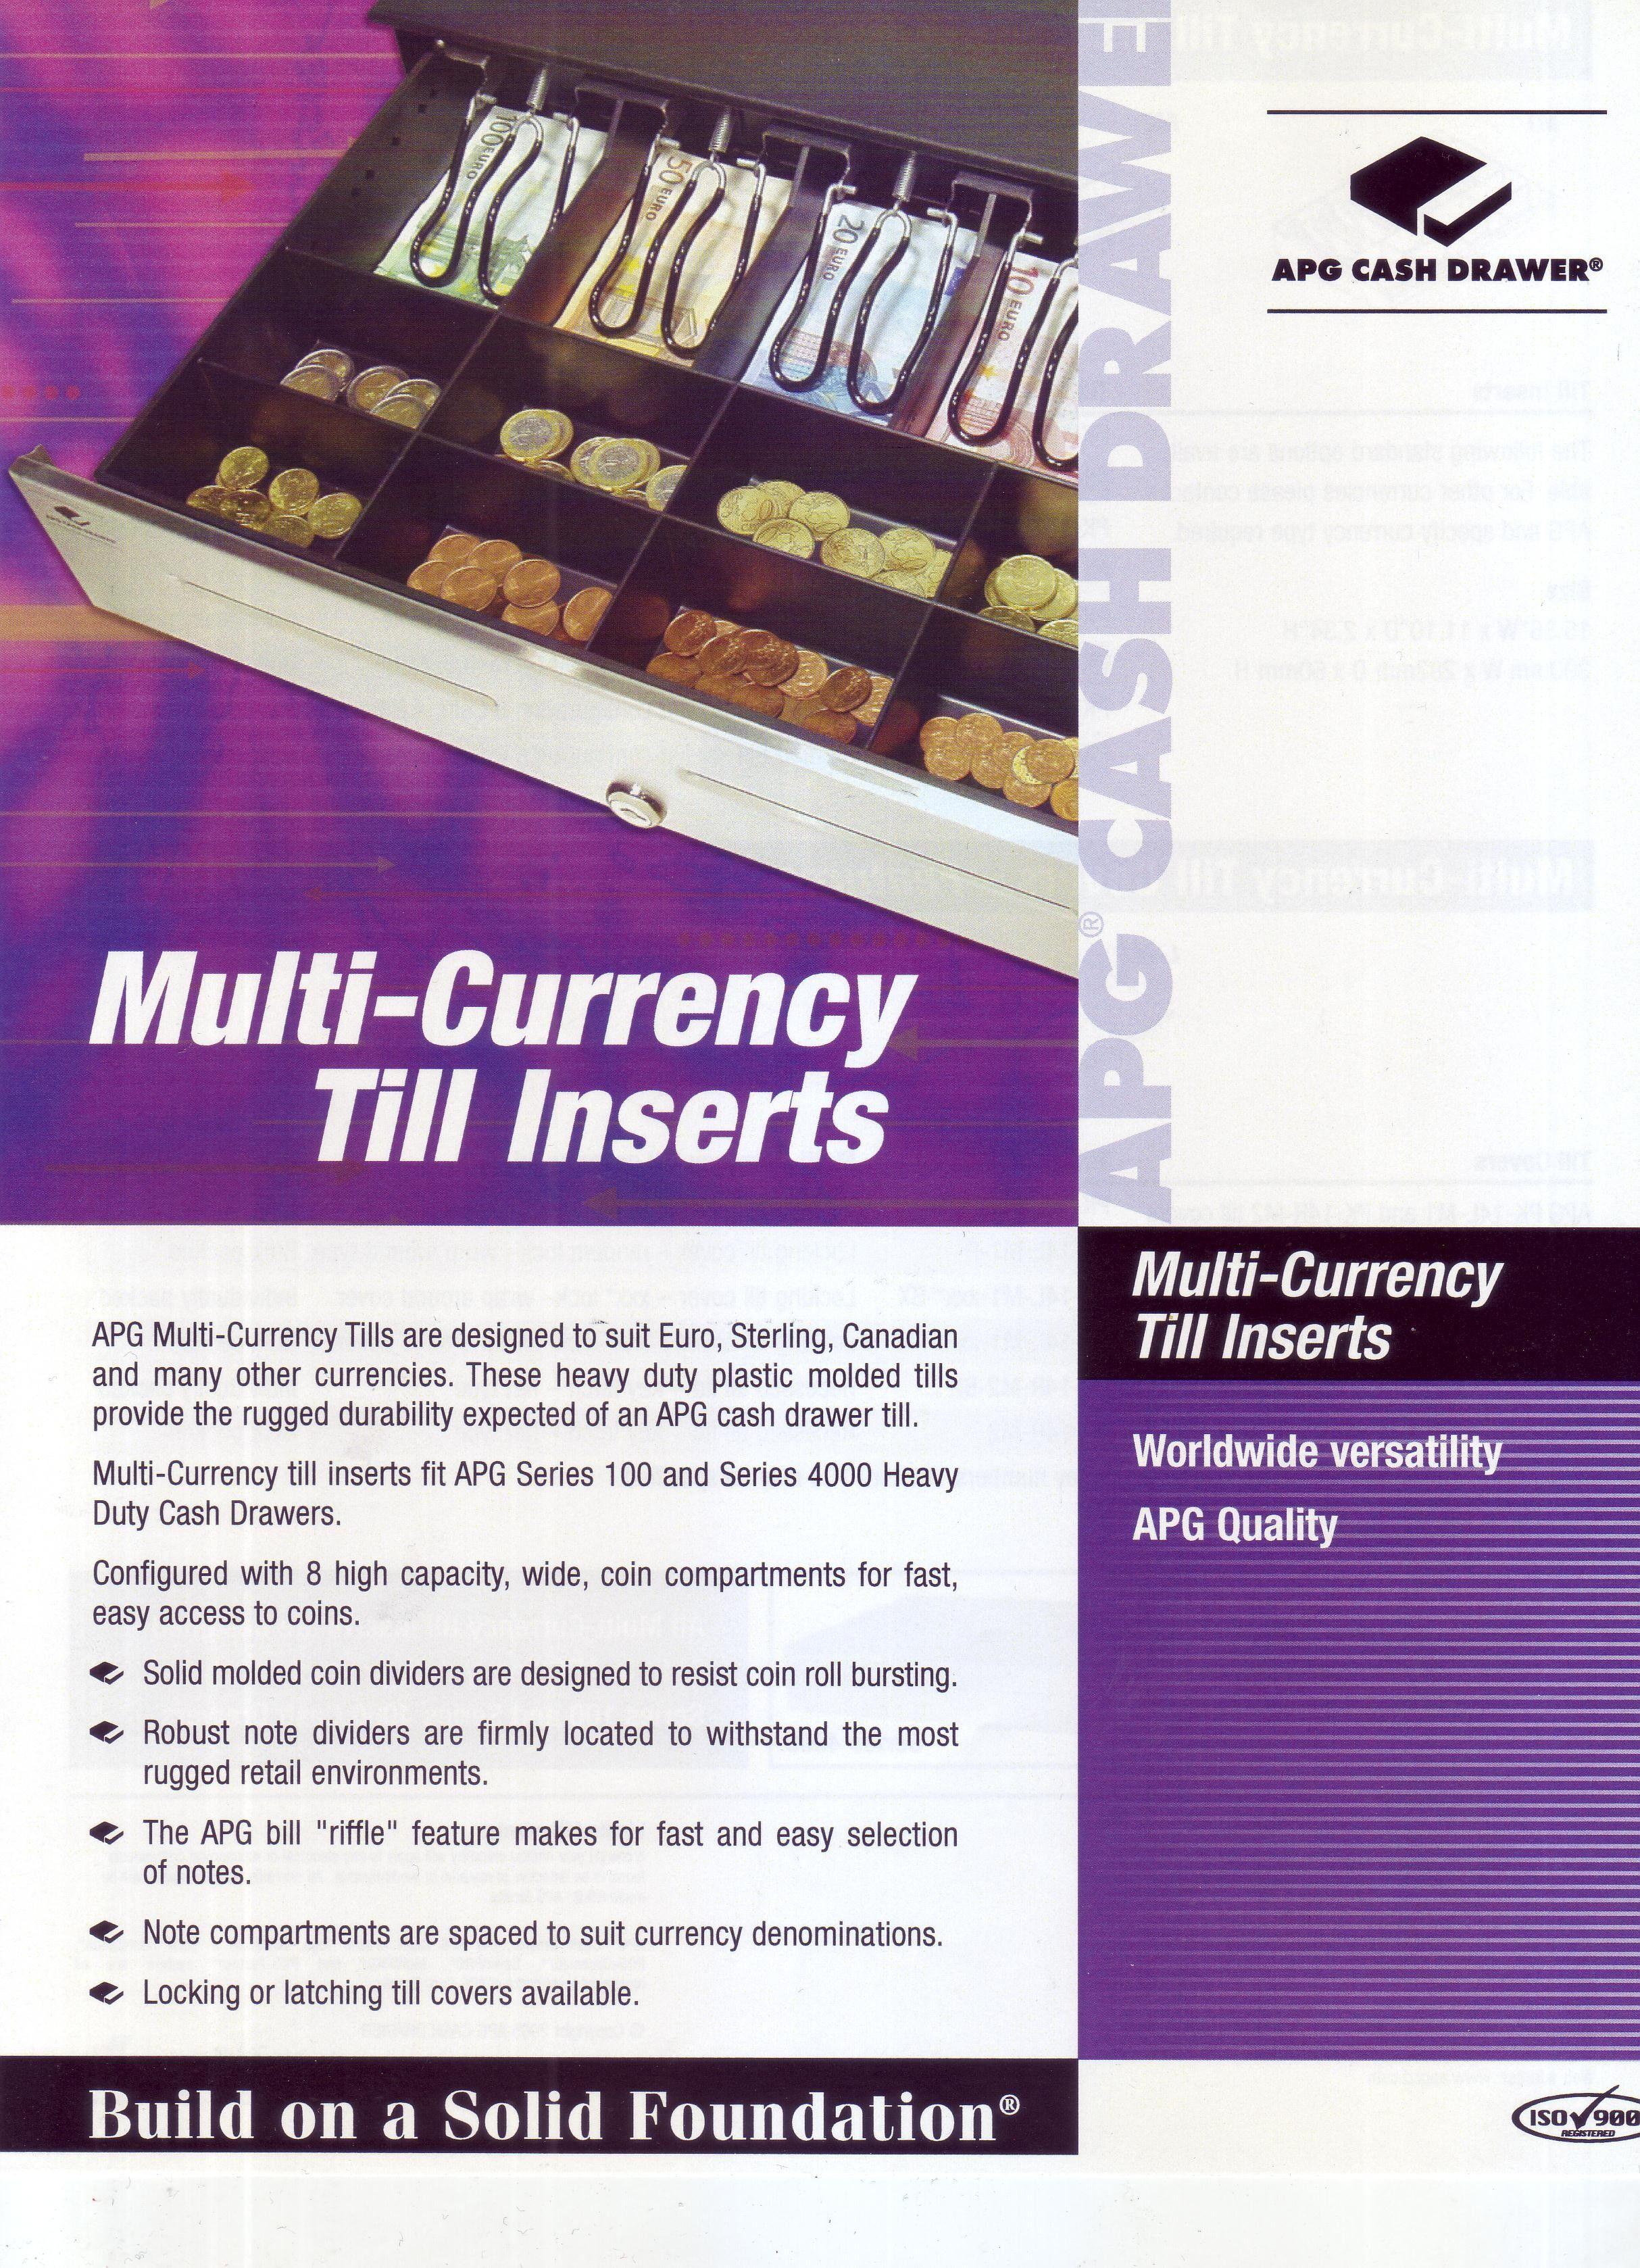 automacao axis acessorios drawer pos left bematech produtos apg fabricantes en network comercial hi scansource door br controller wall cash